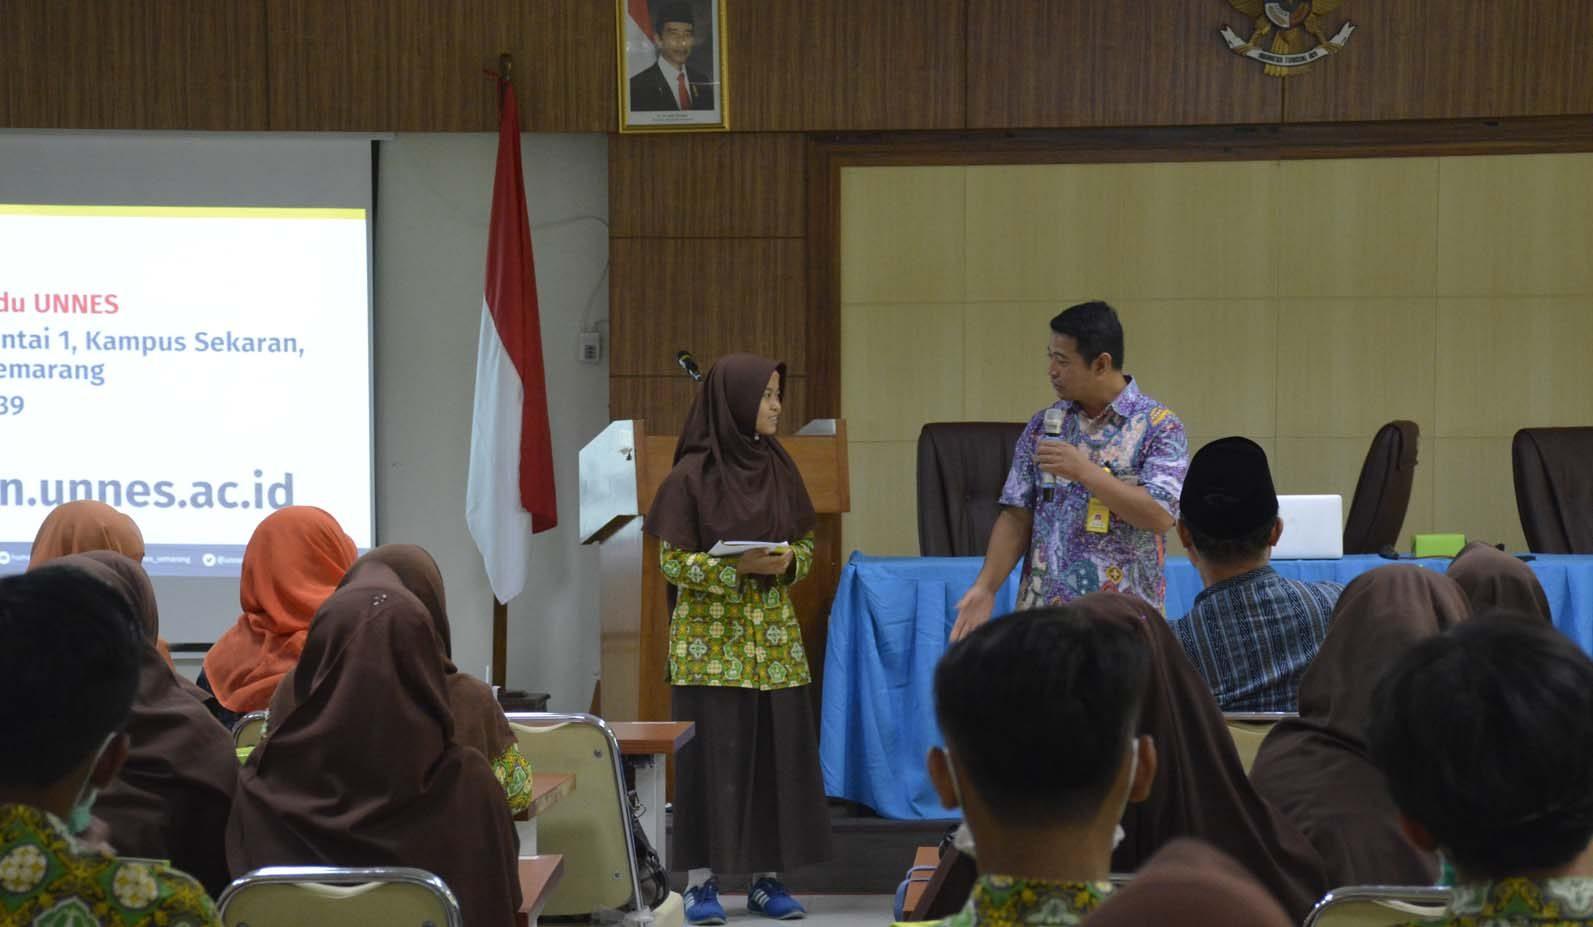 Antusias Siswa MAN 4 Bantul Yogyakarta